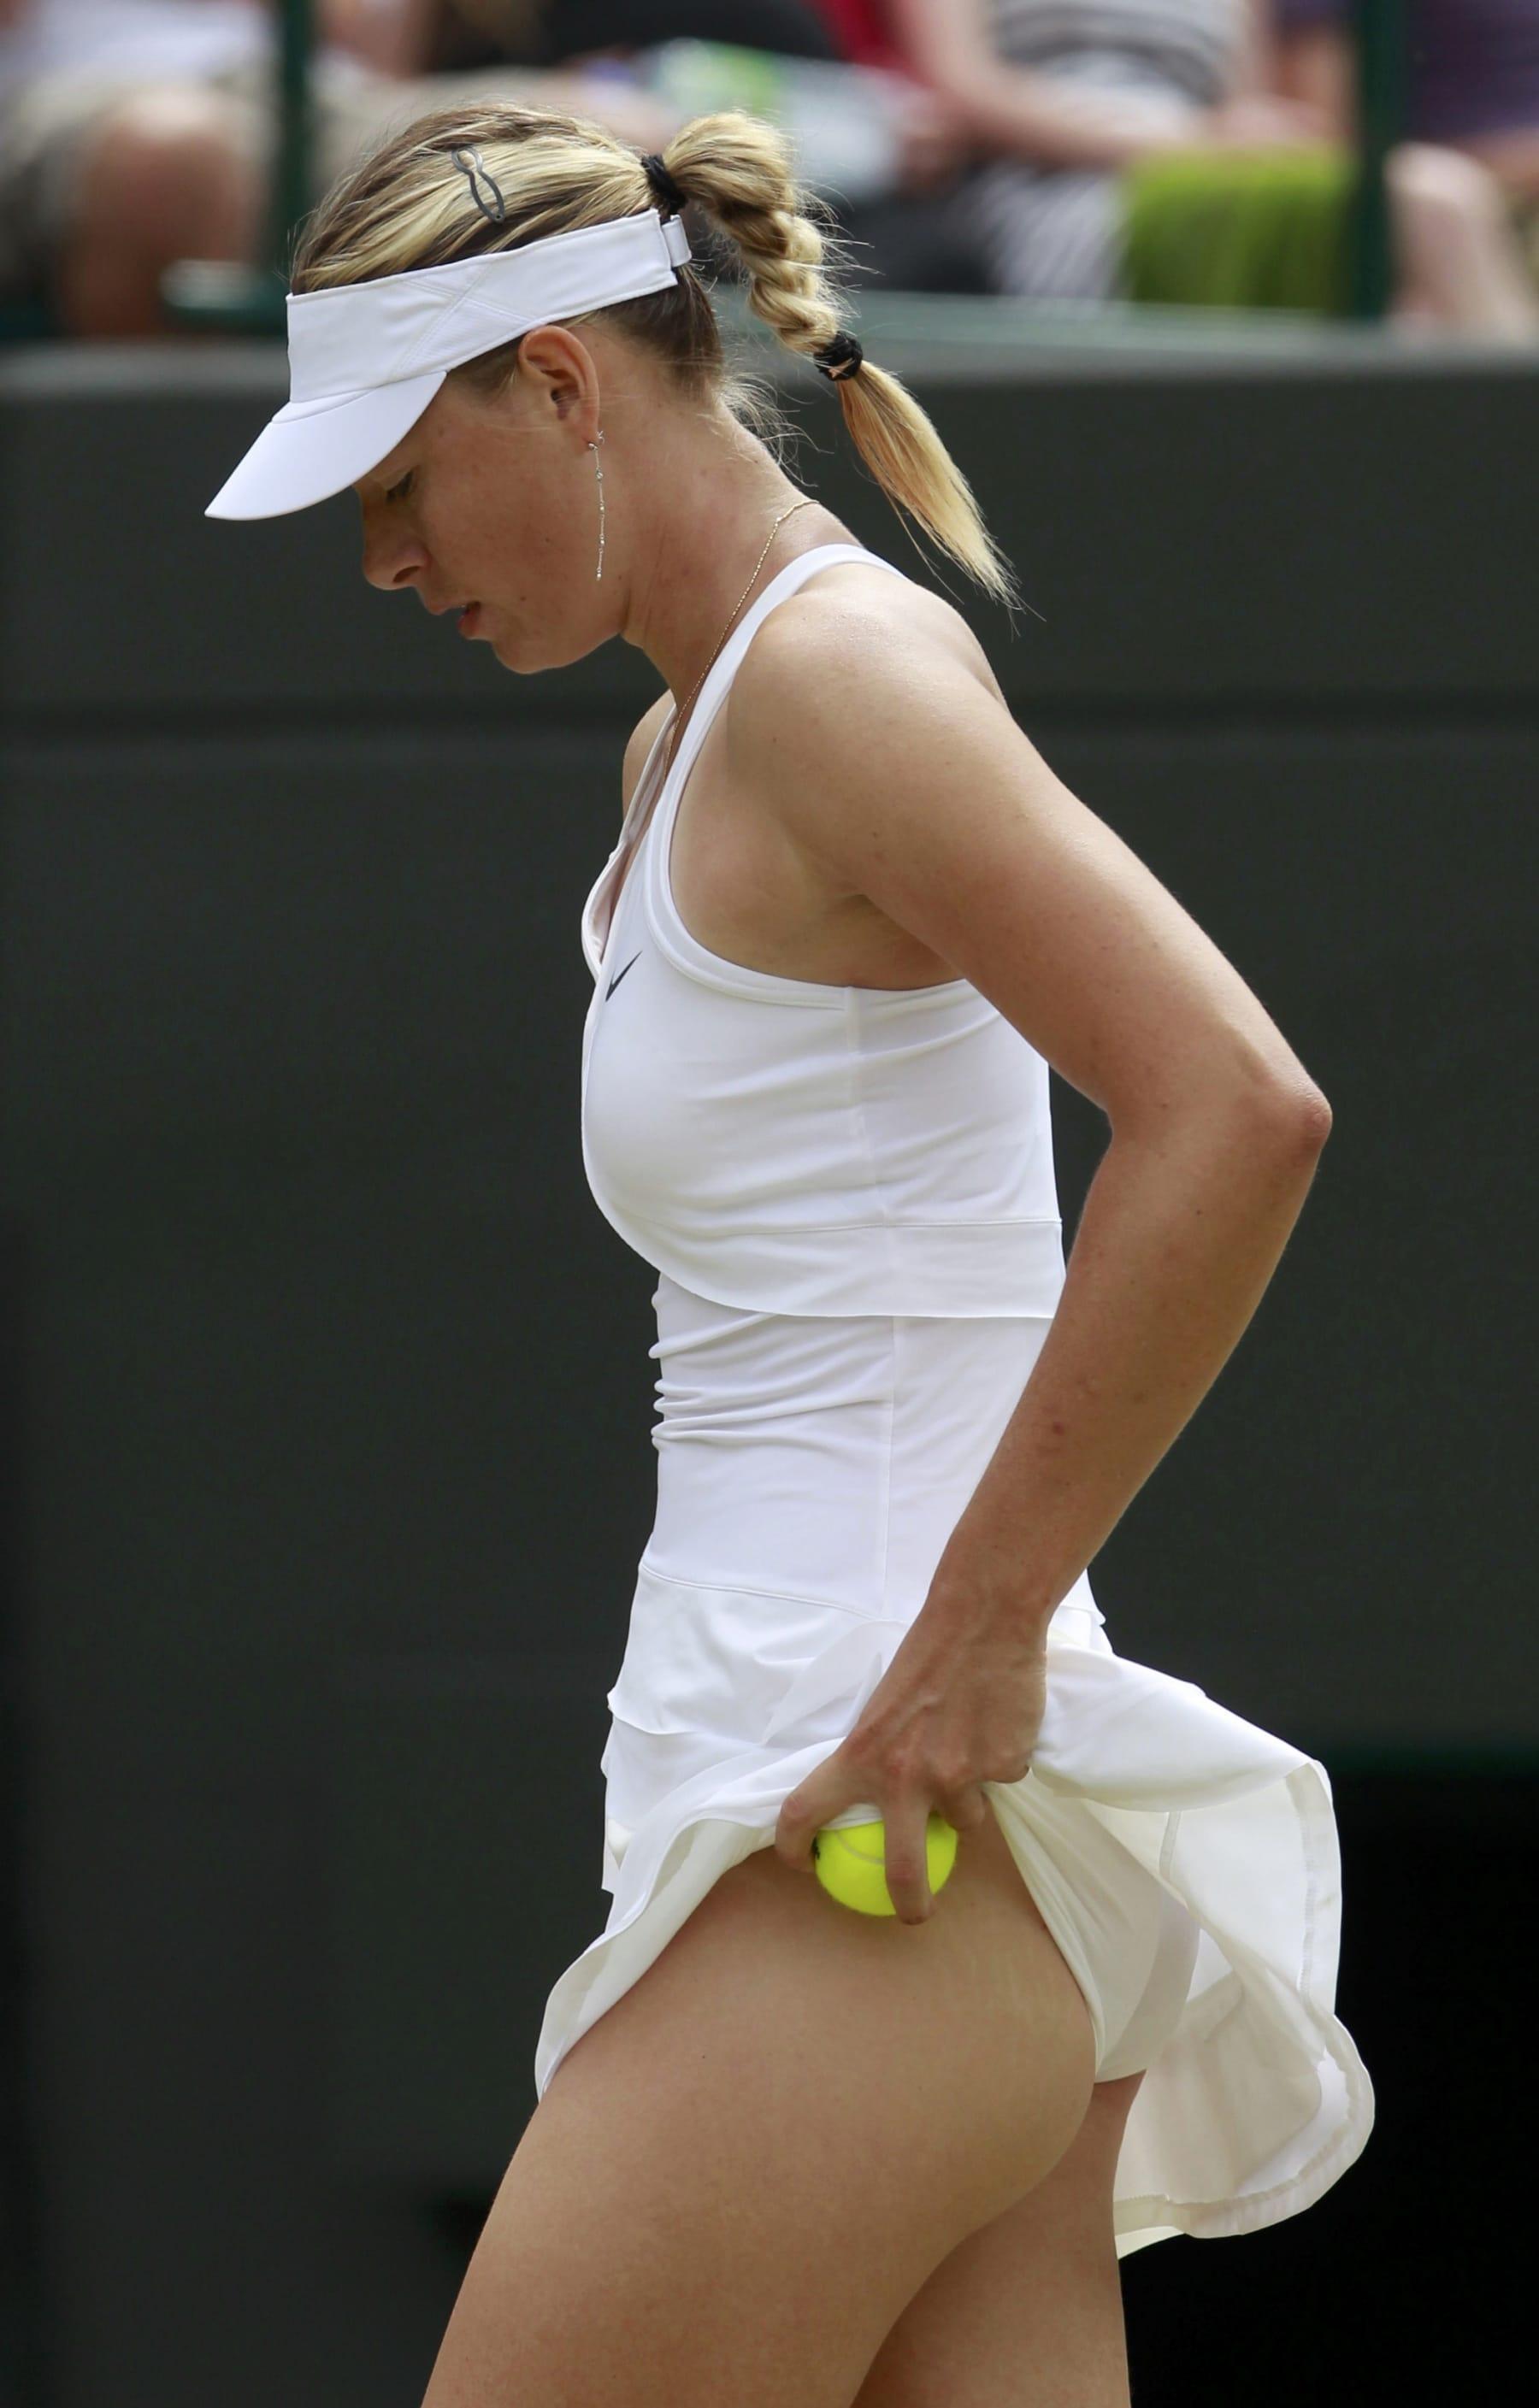 maria sharapova do not get panties bunch